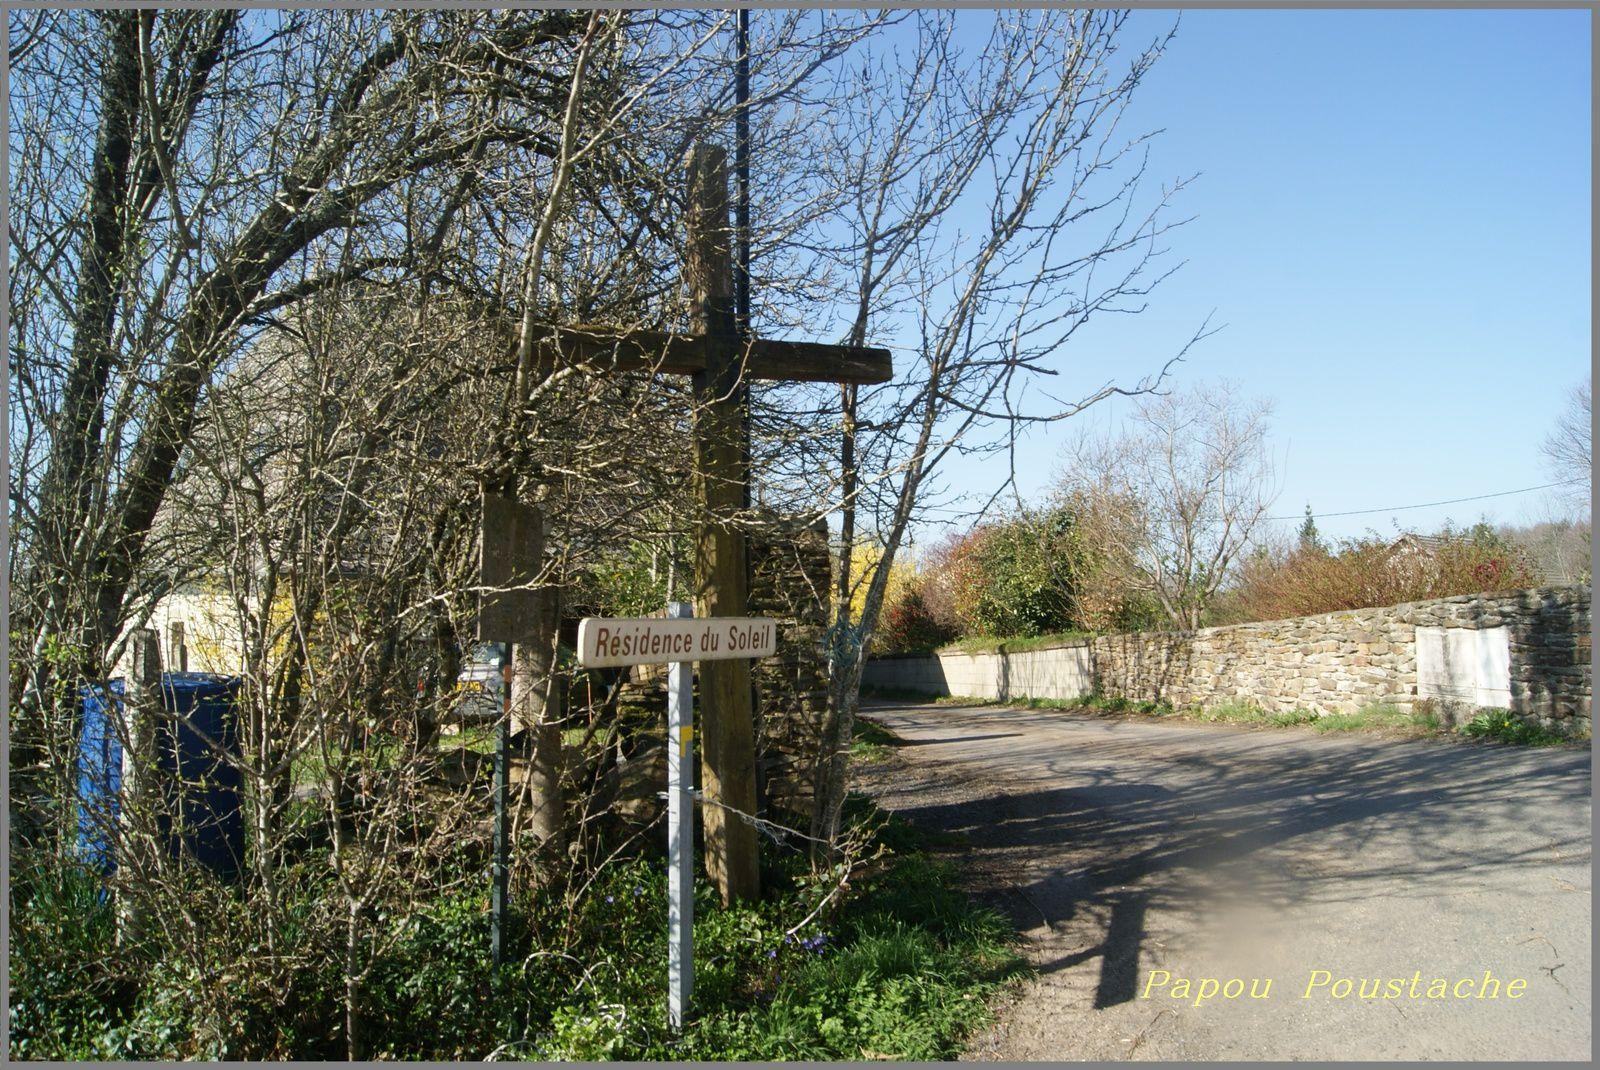 Teissières lès Bouliès